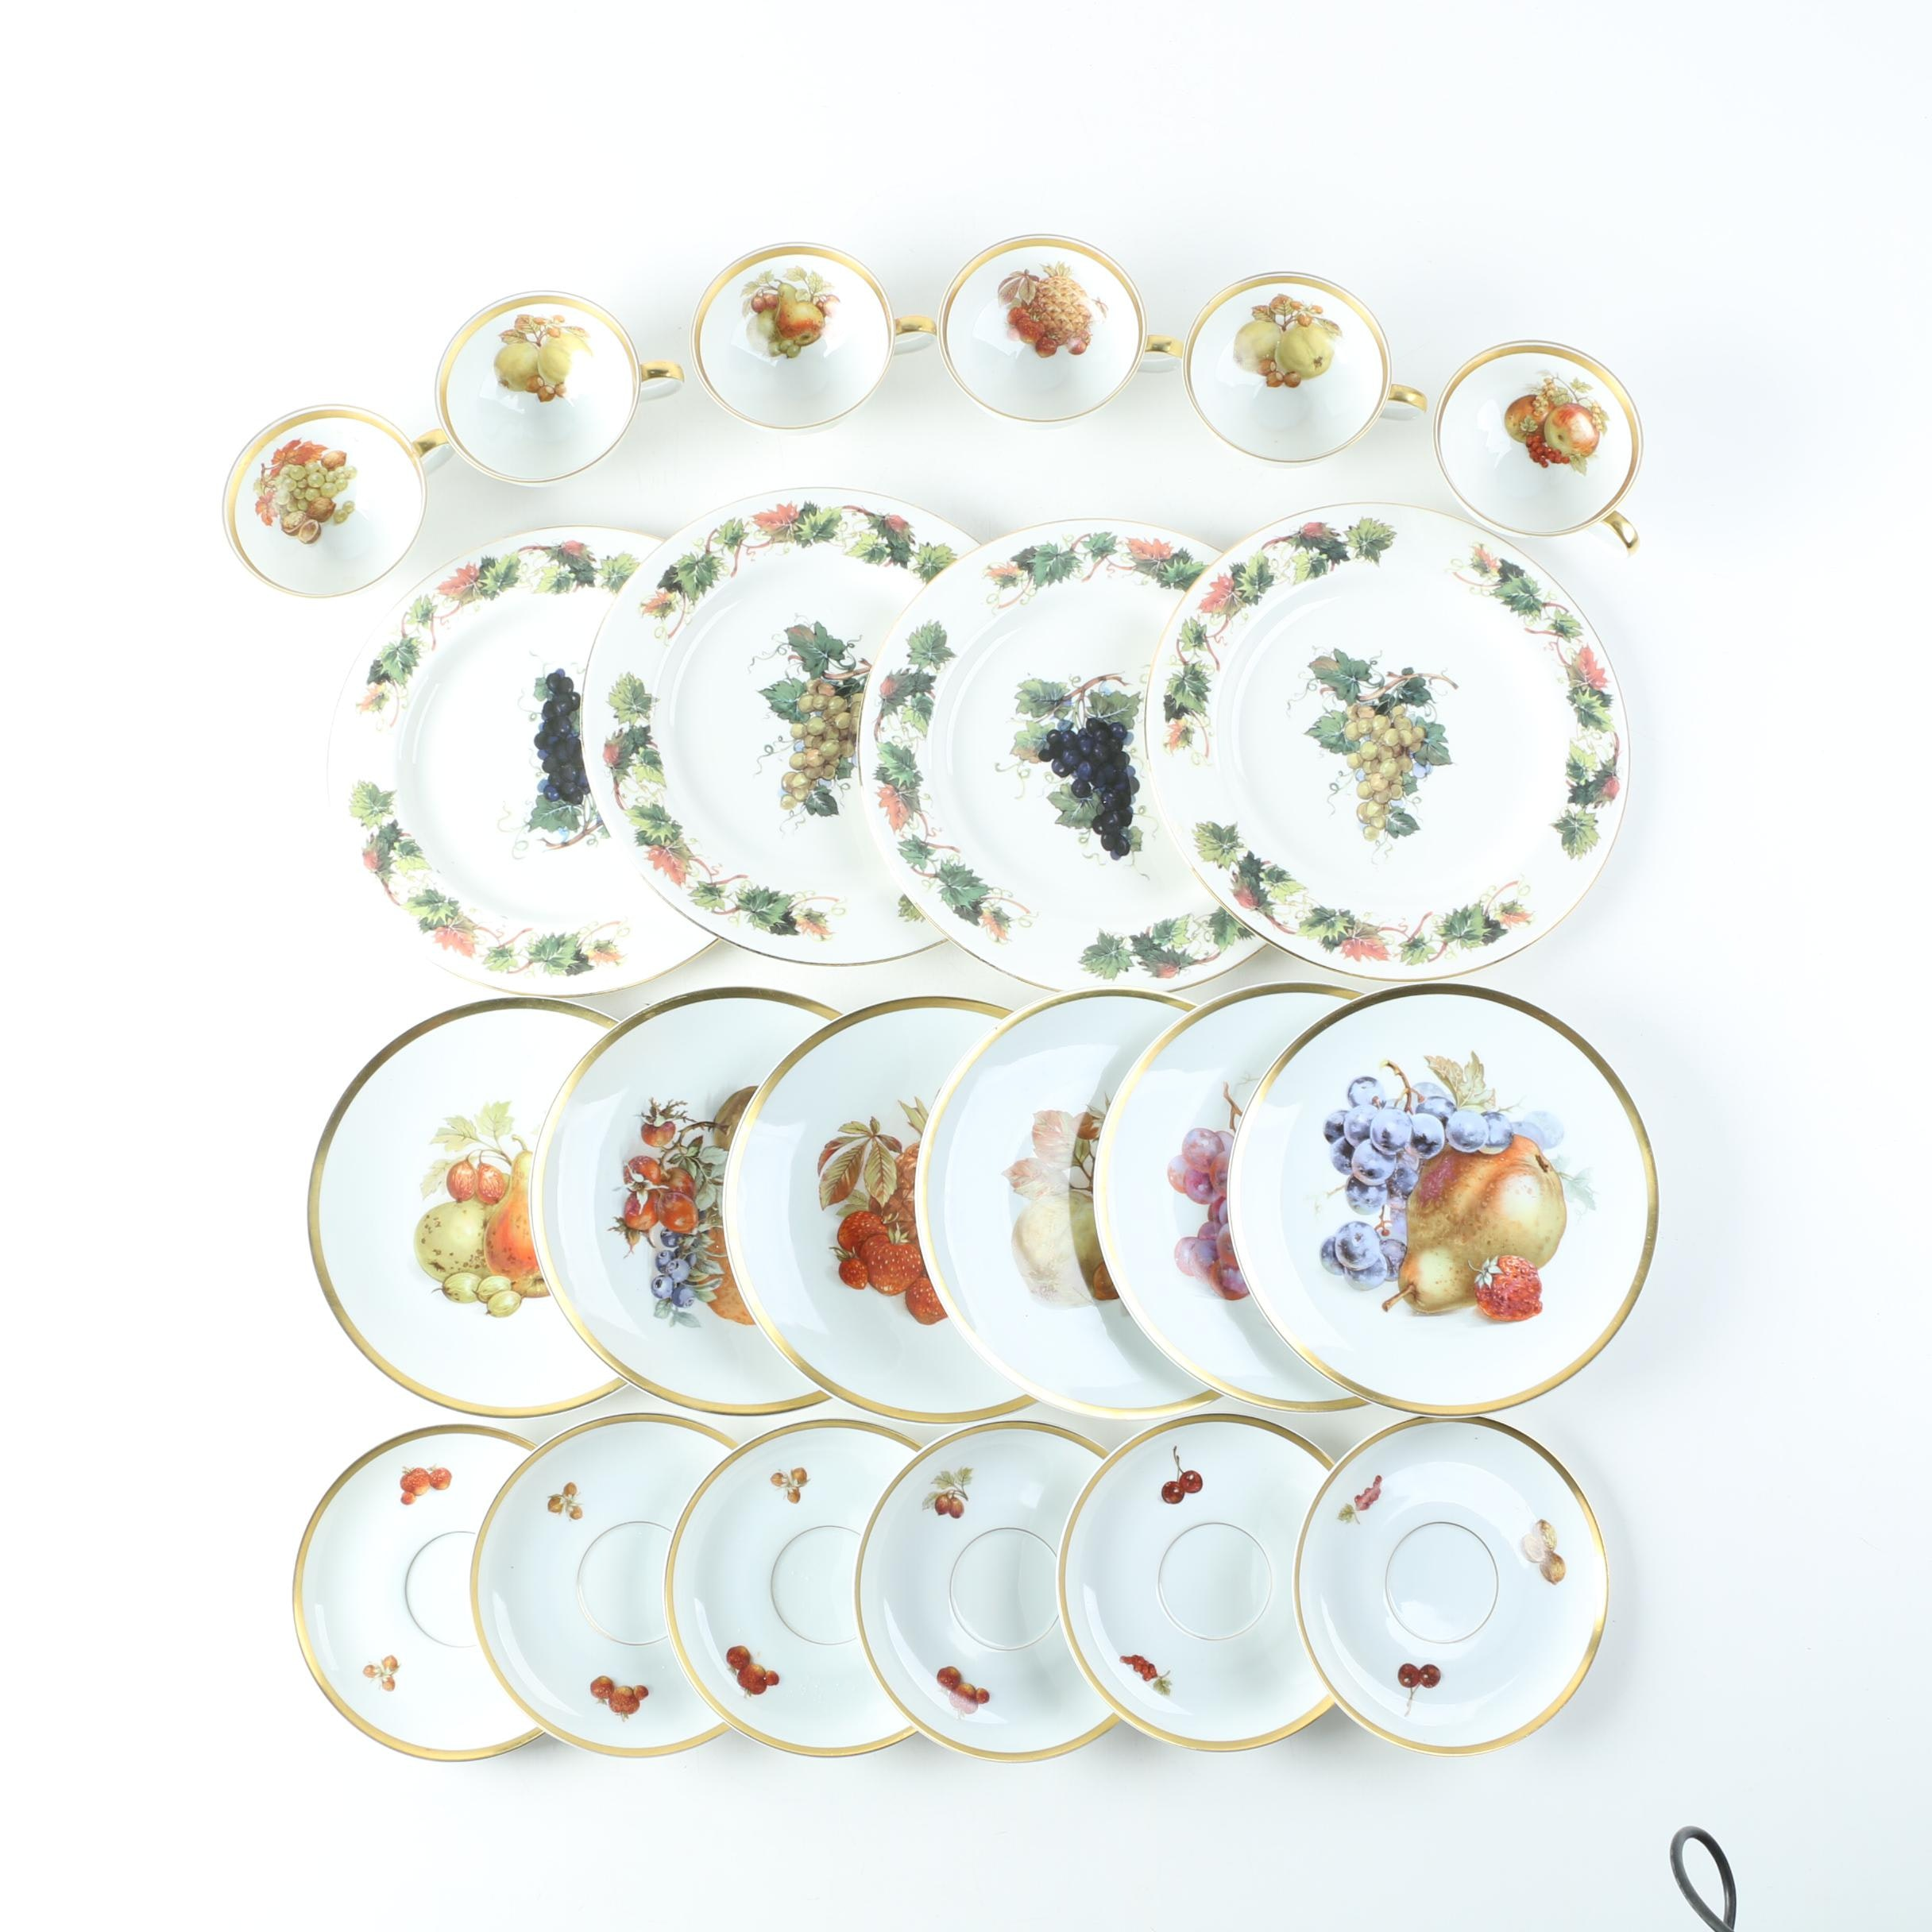 Vintage Porcelain Tableware Featuring Ebeling & Reuss Co.